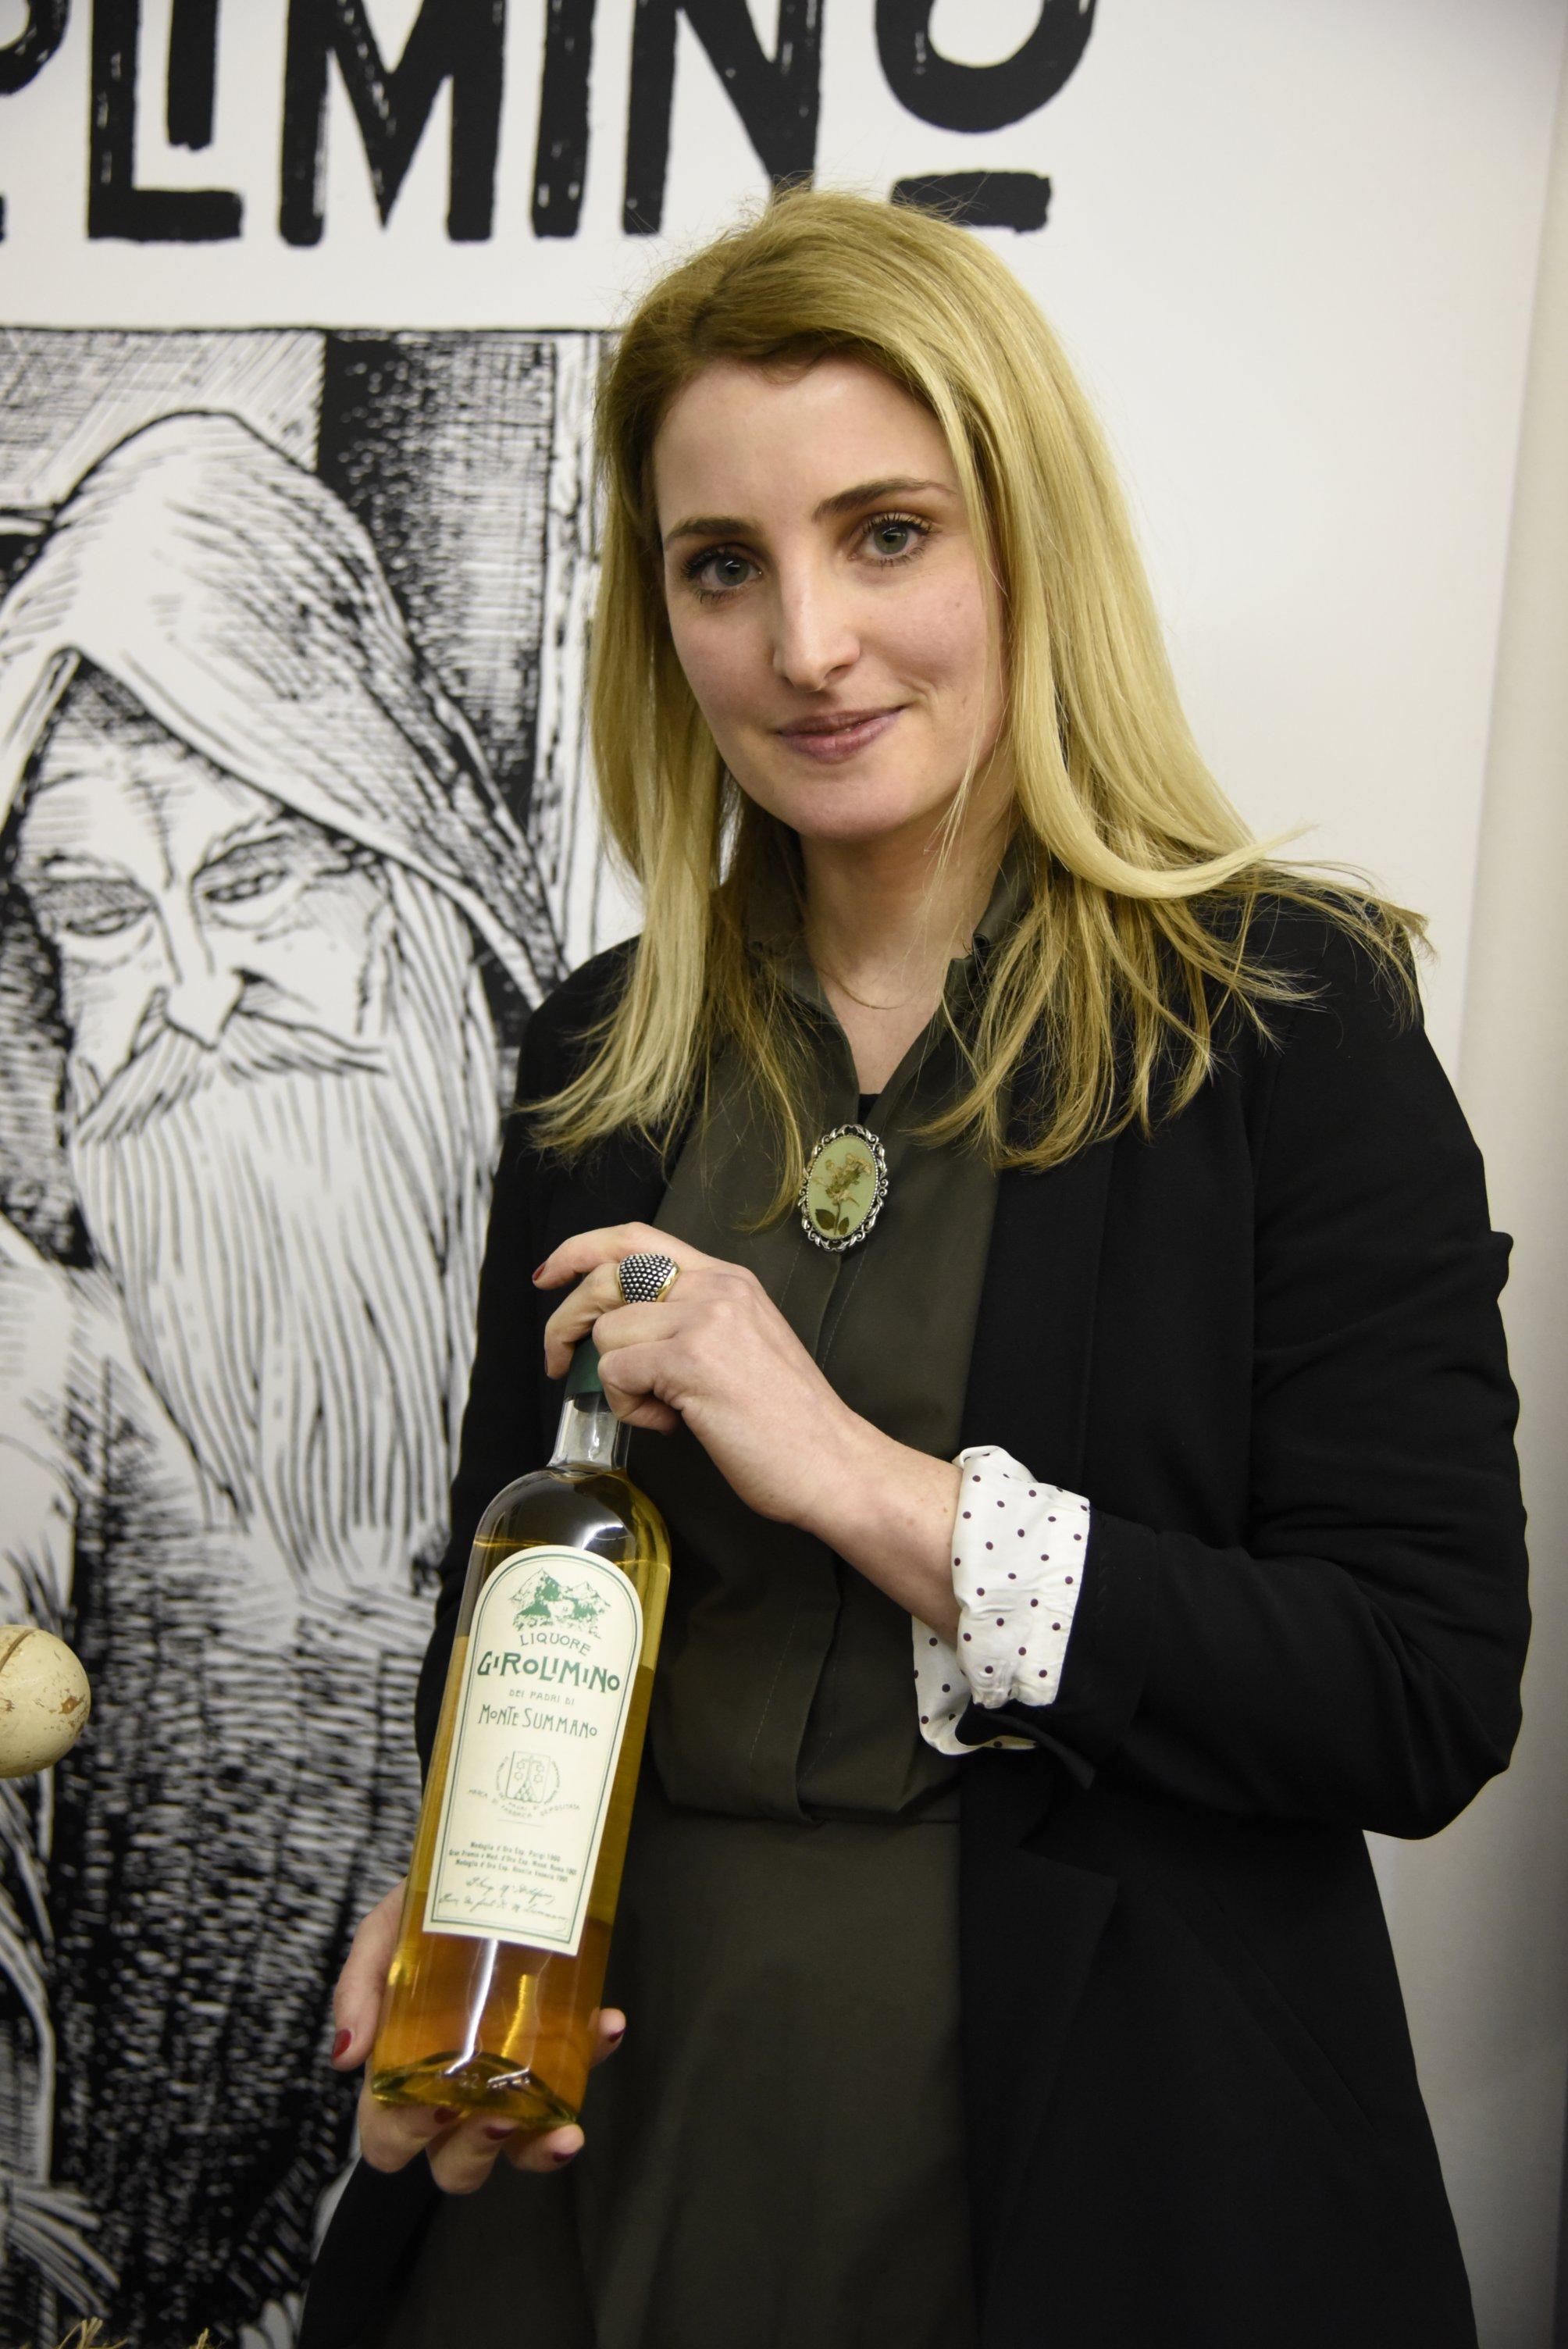 Ilaria with Girolimino liqueur